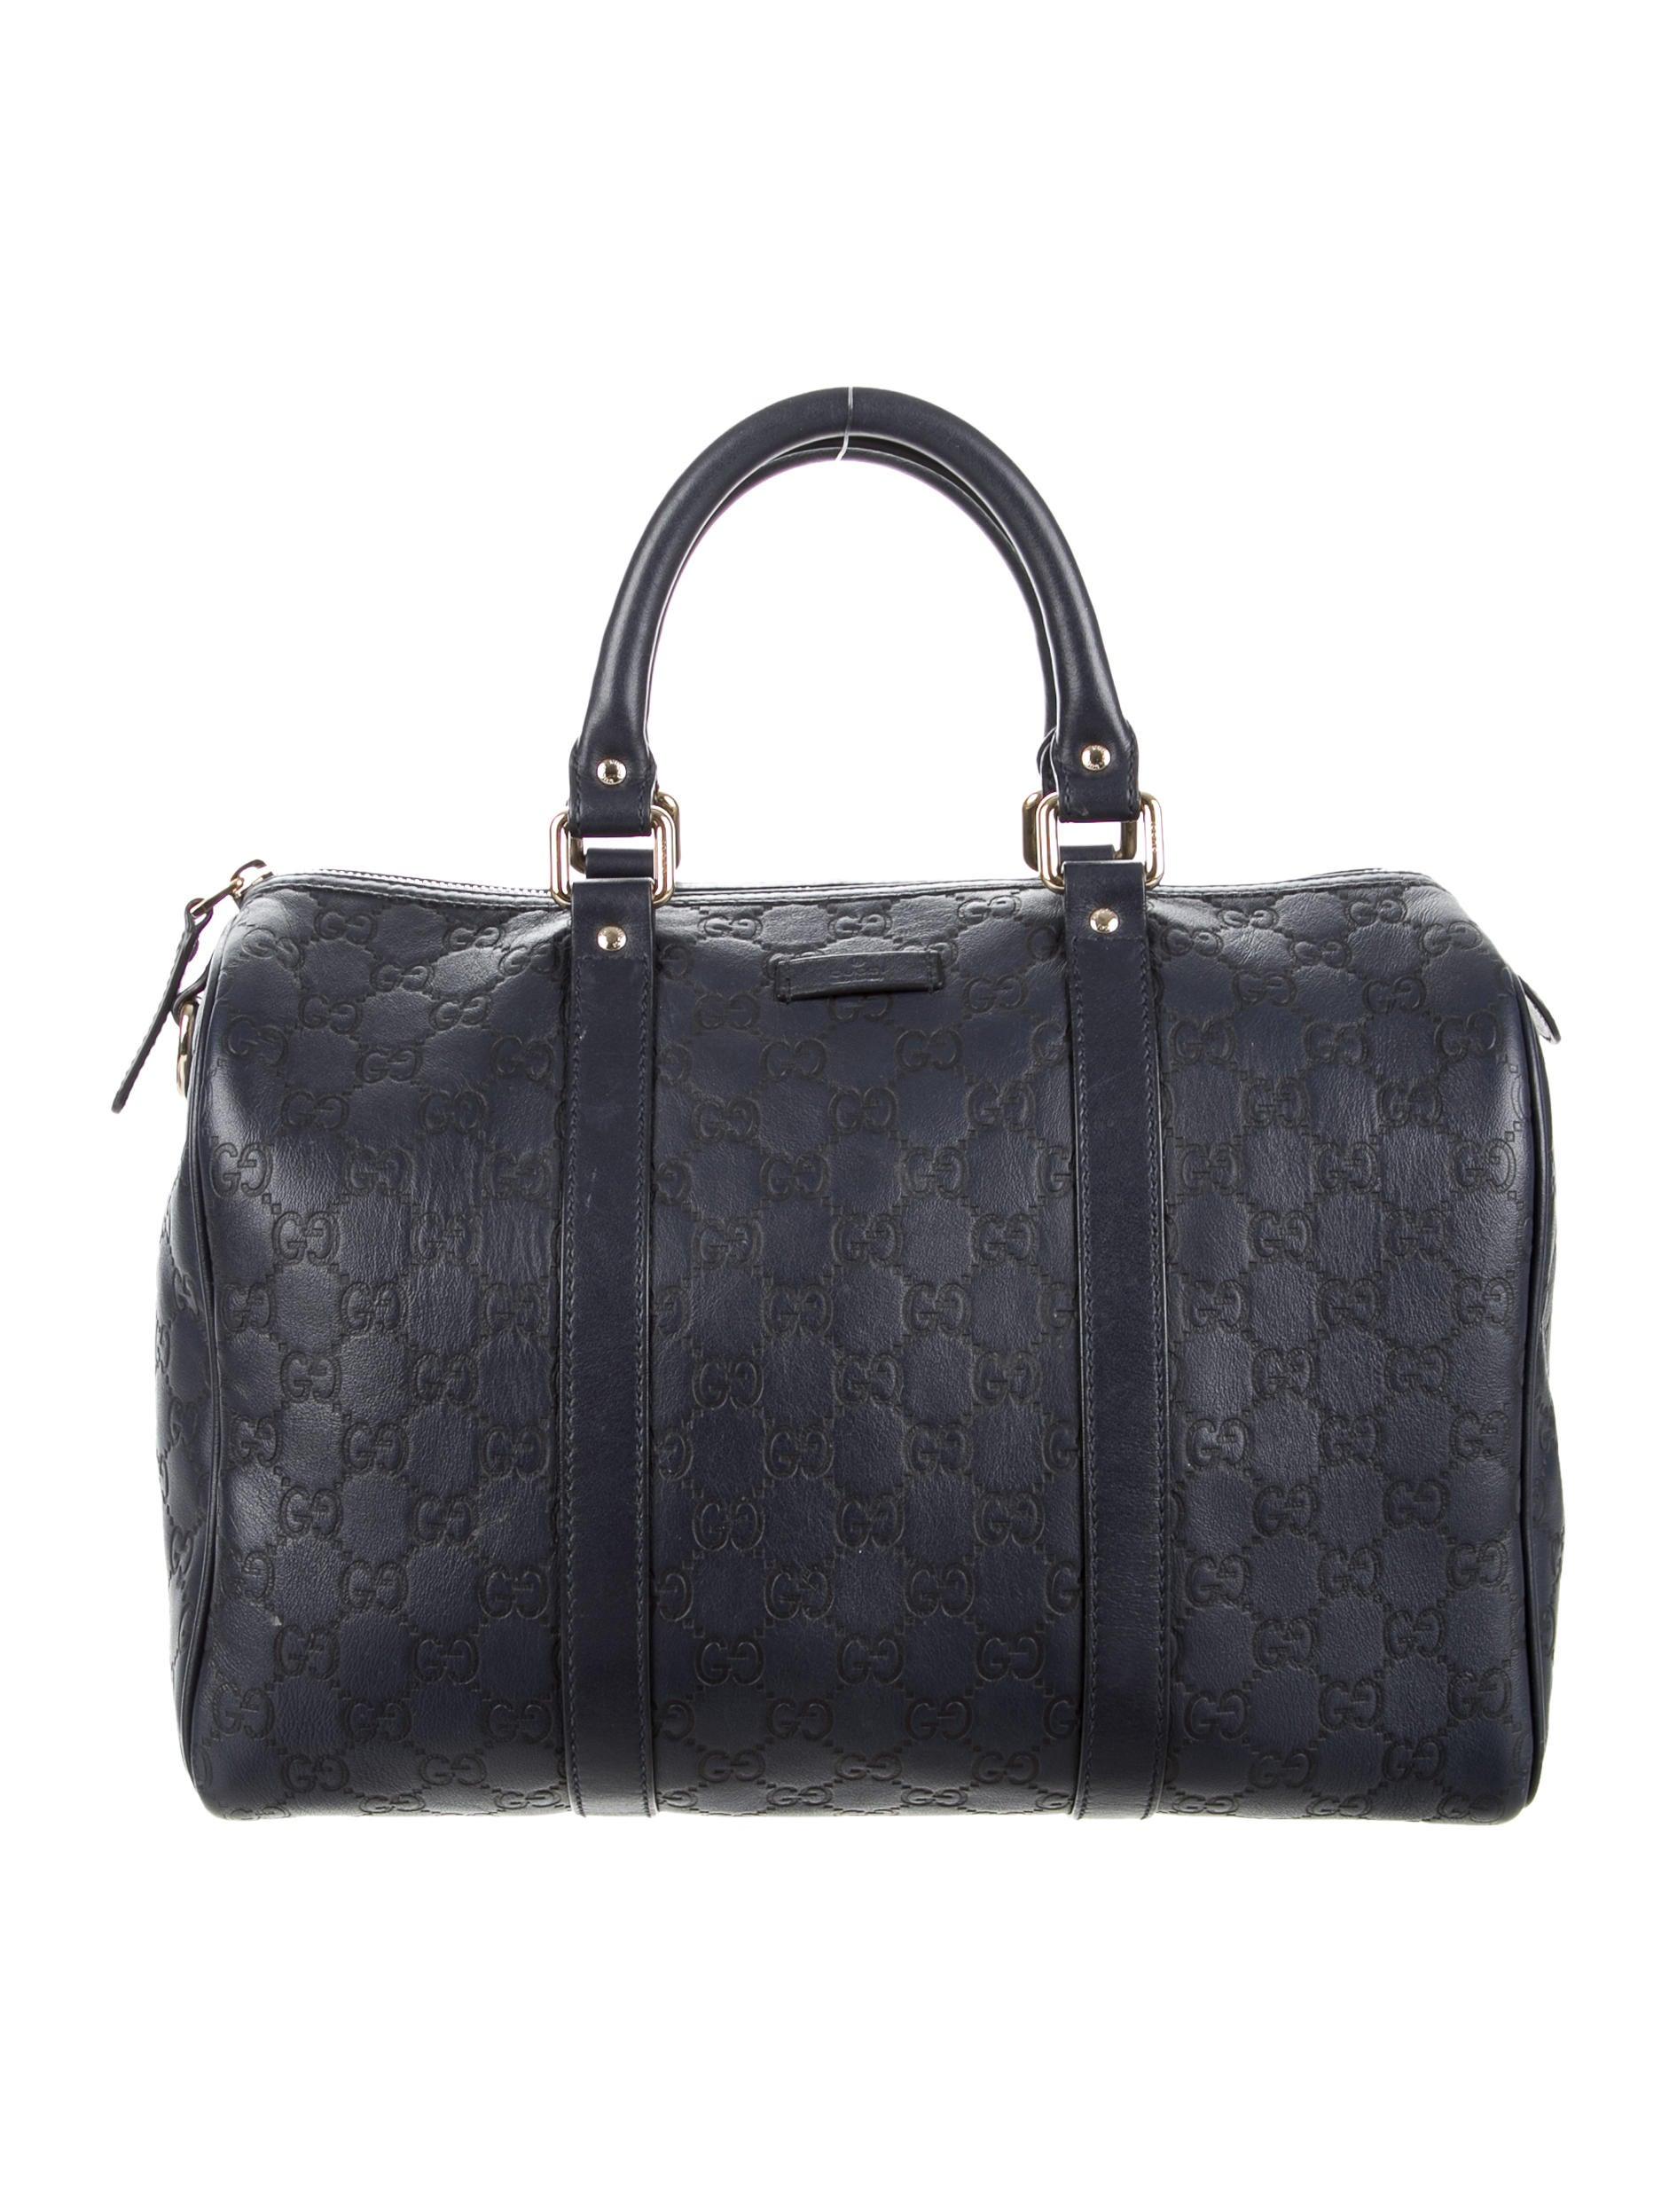 Boston Bag Patchwork Tutorial: Gucci Guccissima Joy Boston Bag